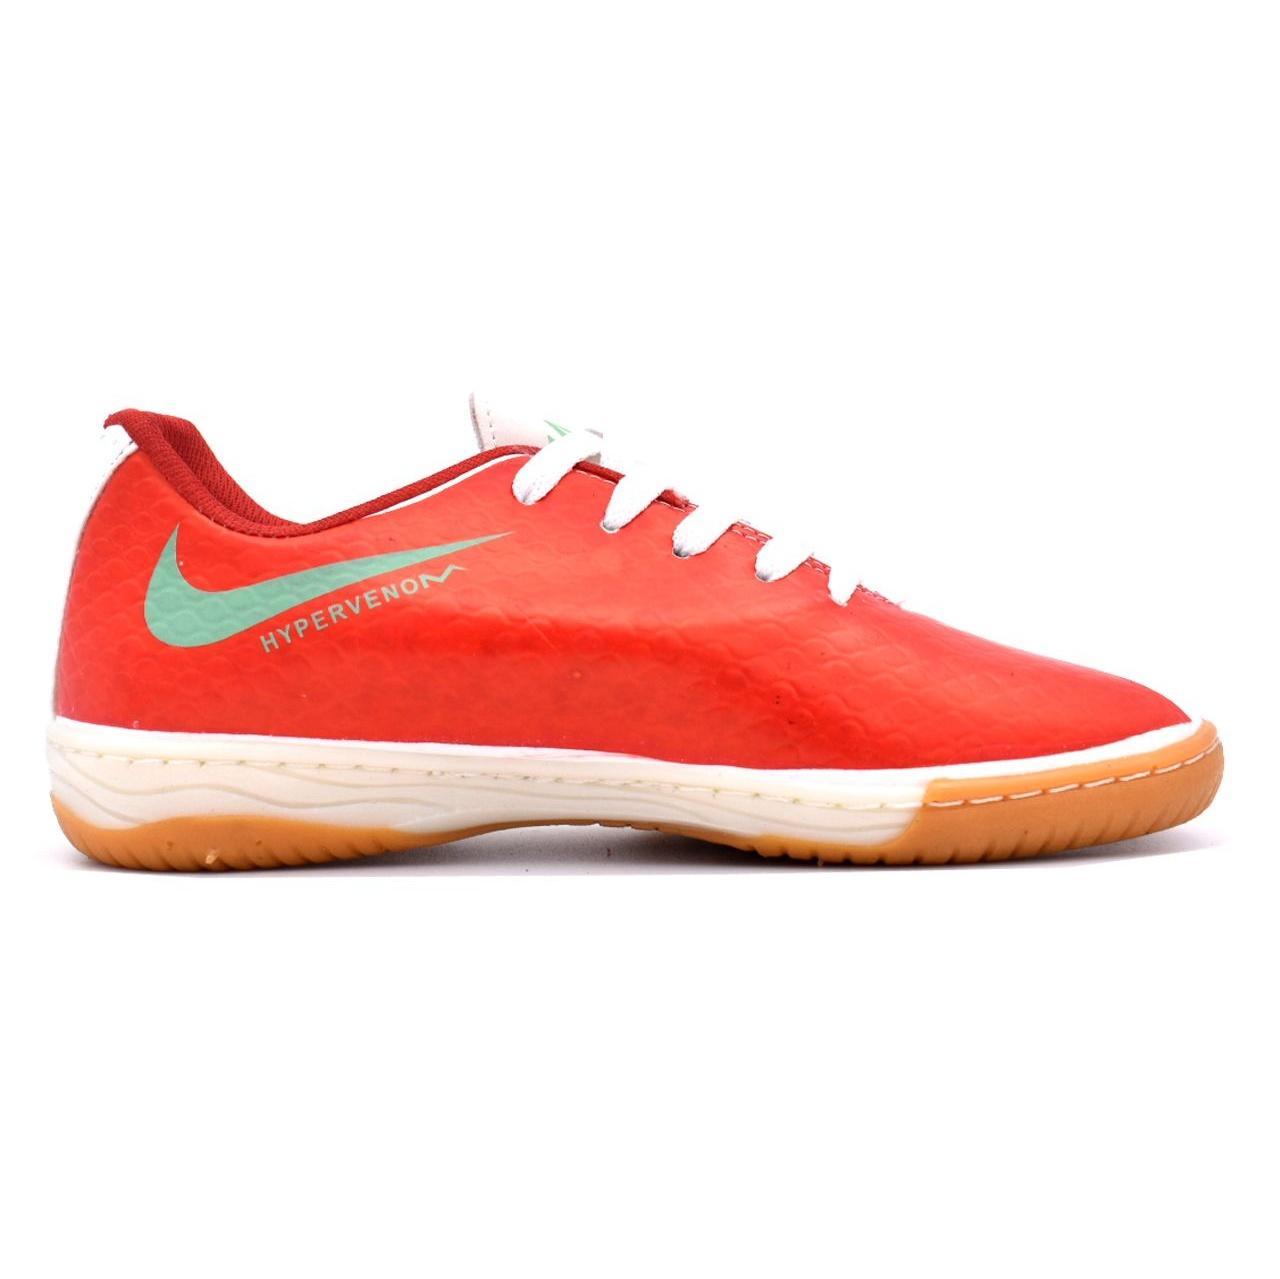 قیمت خرید کفش فوتسال مردانه کد 1010 اورجینال